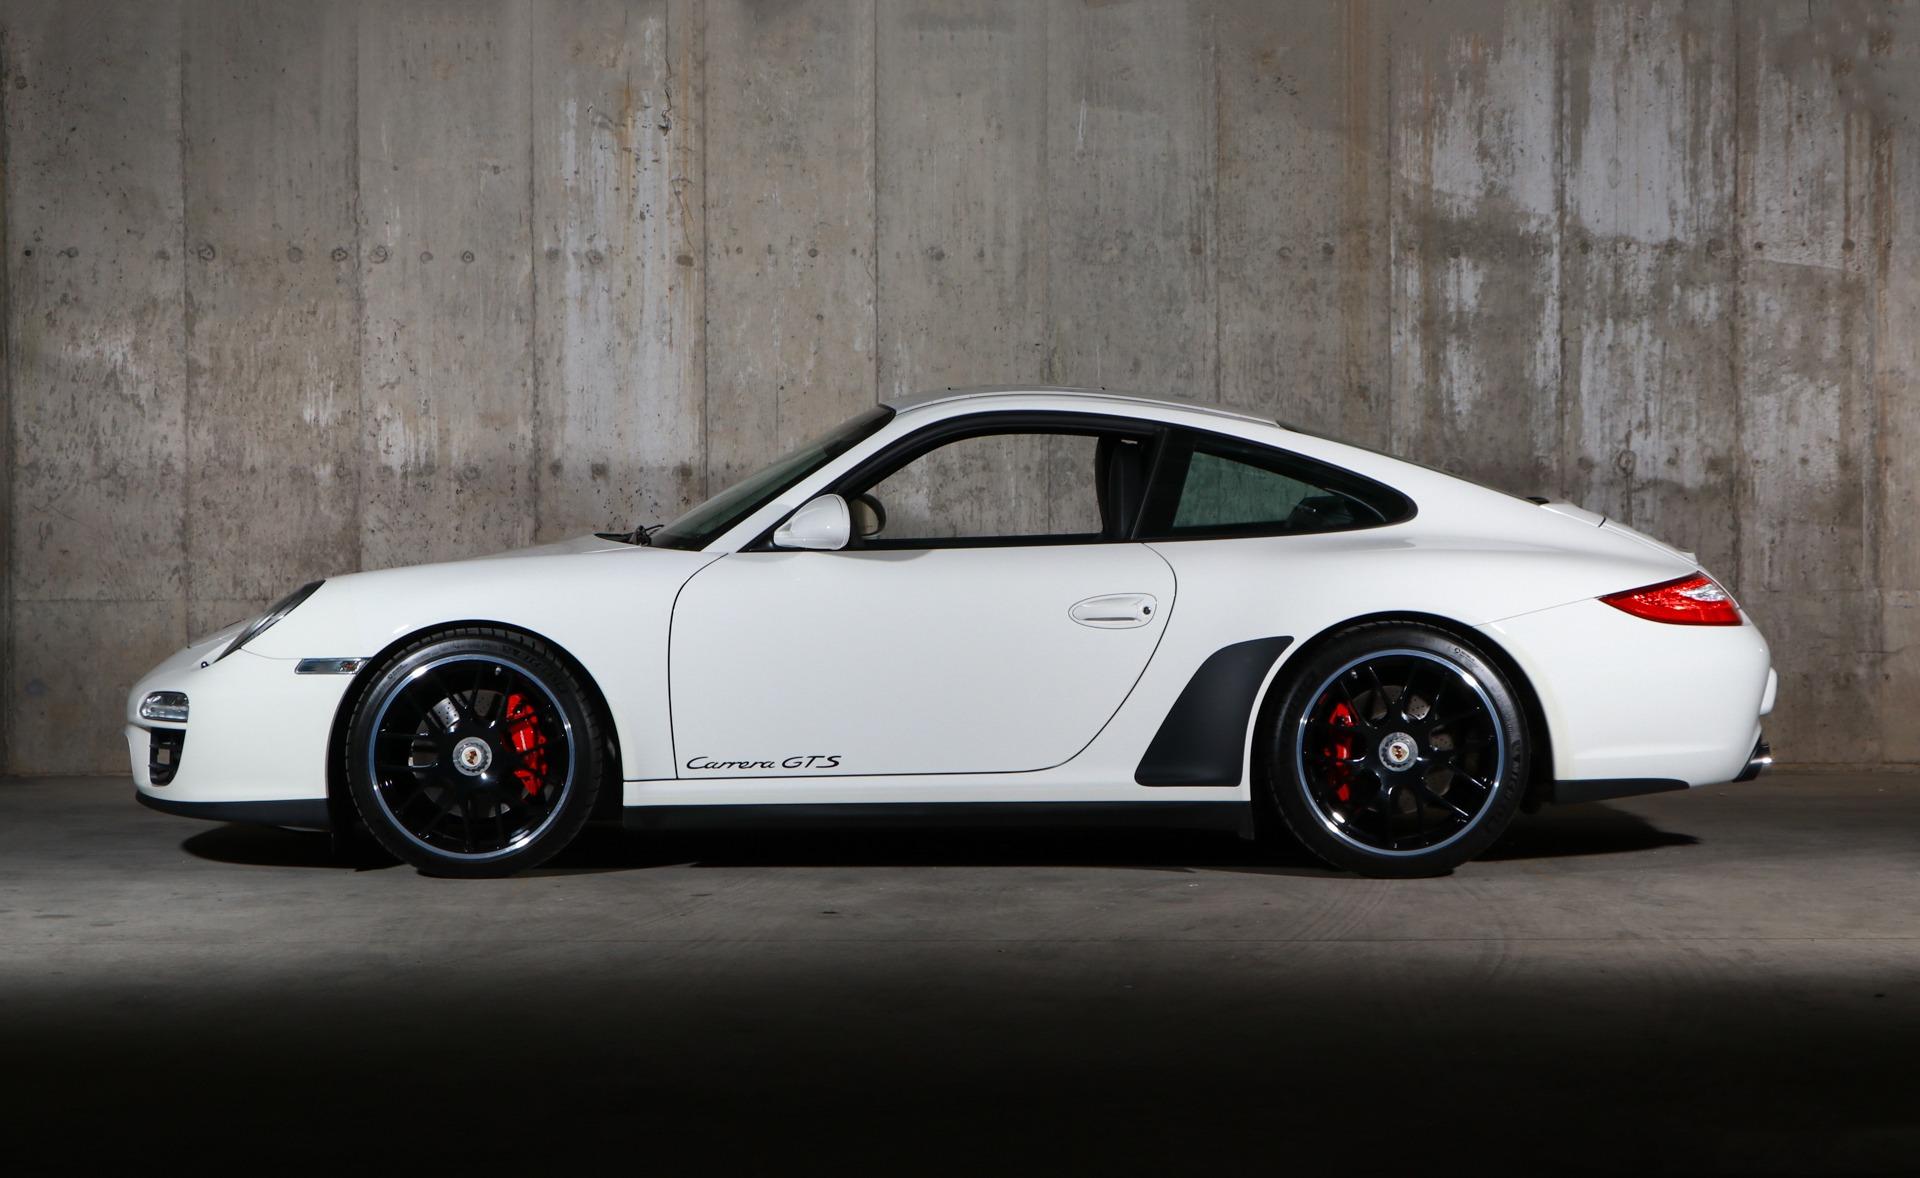 Used 2012 Porsche 911 Carrera GTS | Glen Cove, NY